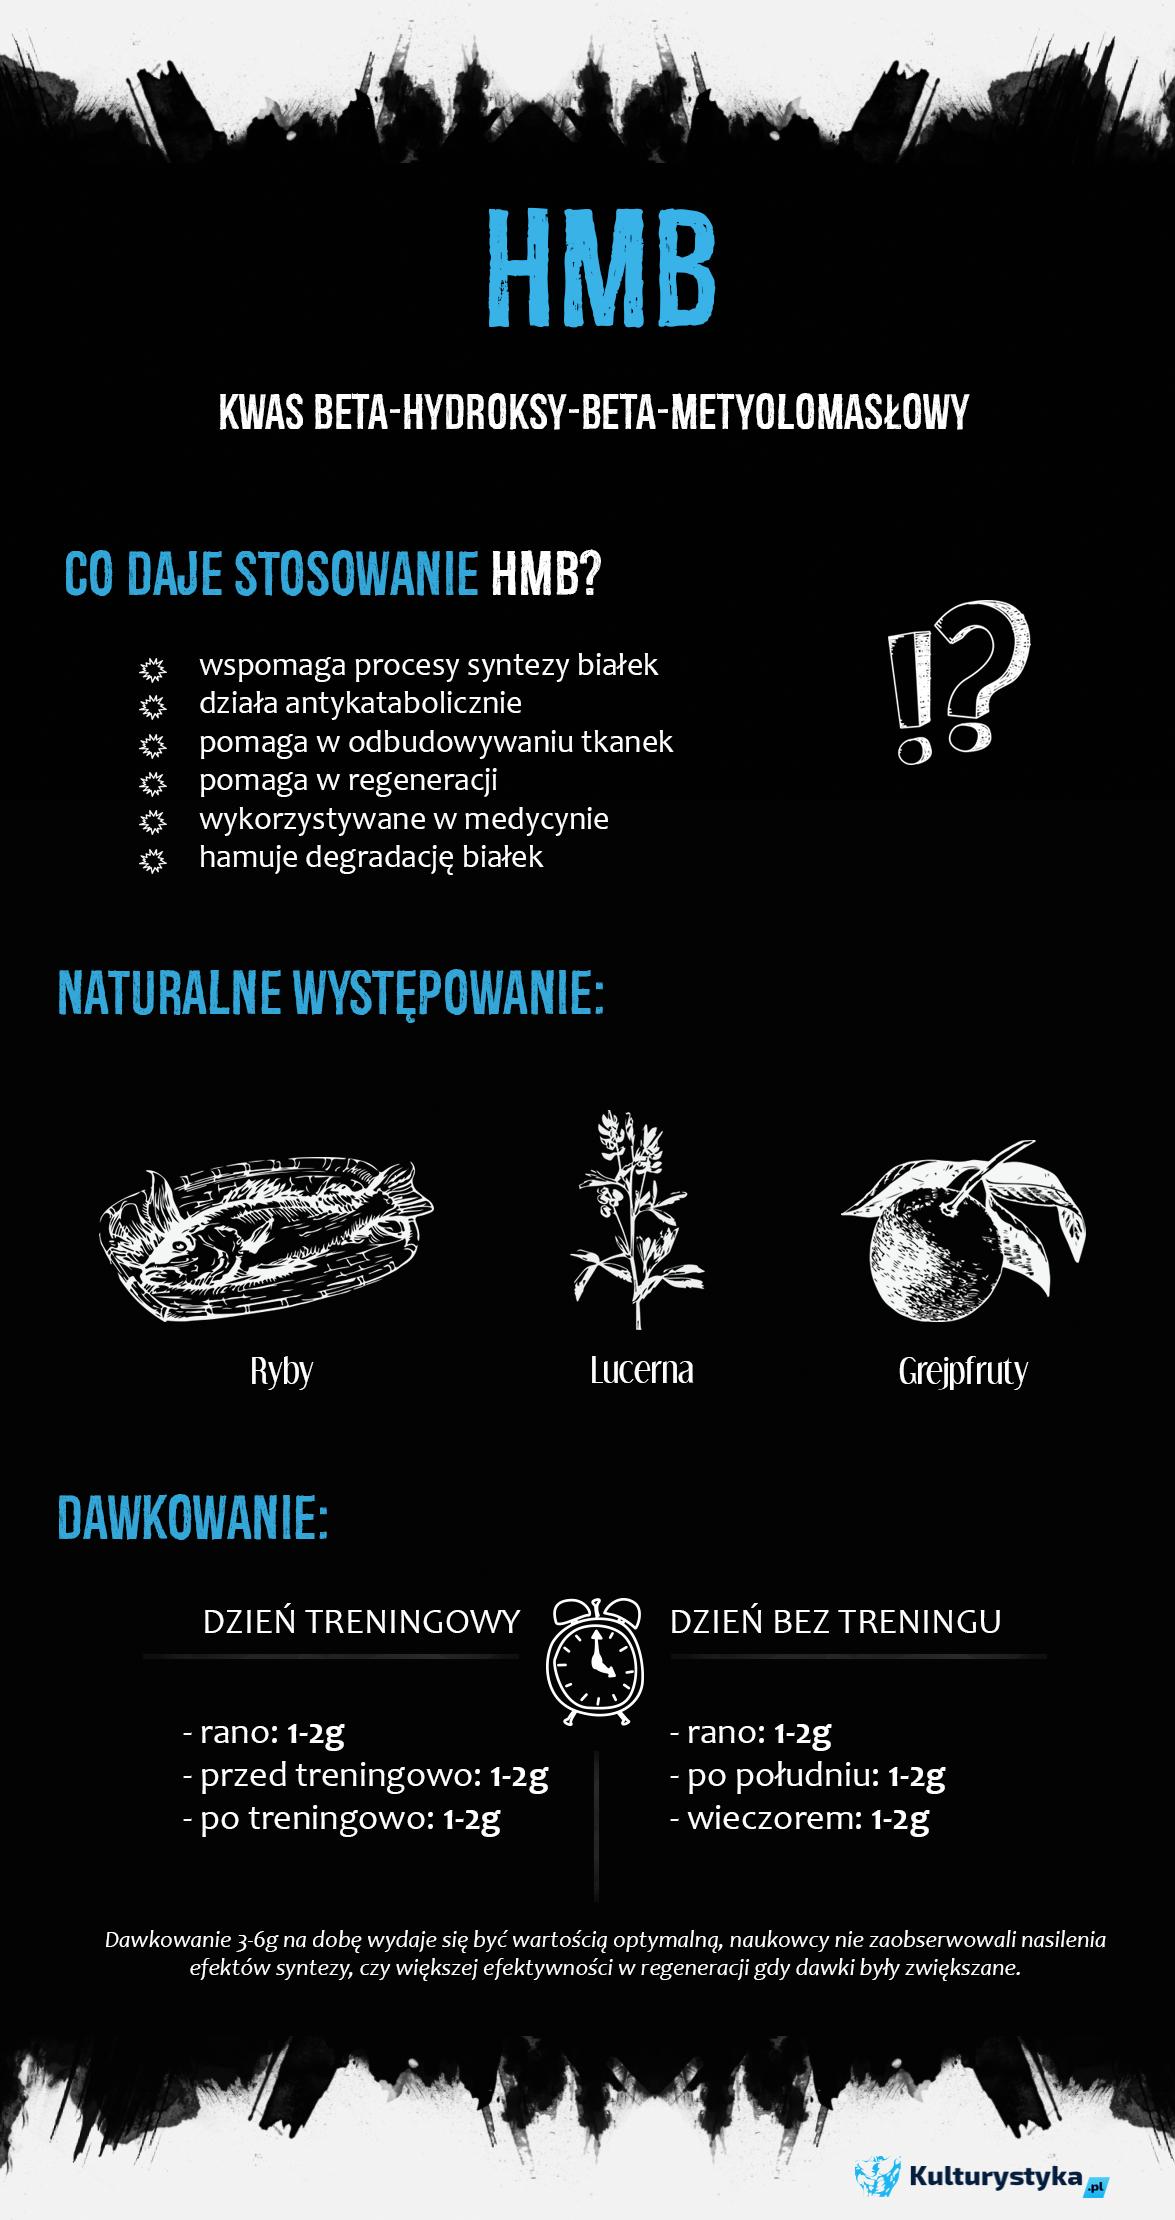 infogrfka hmb